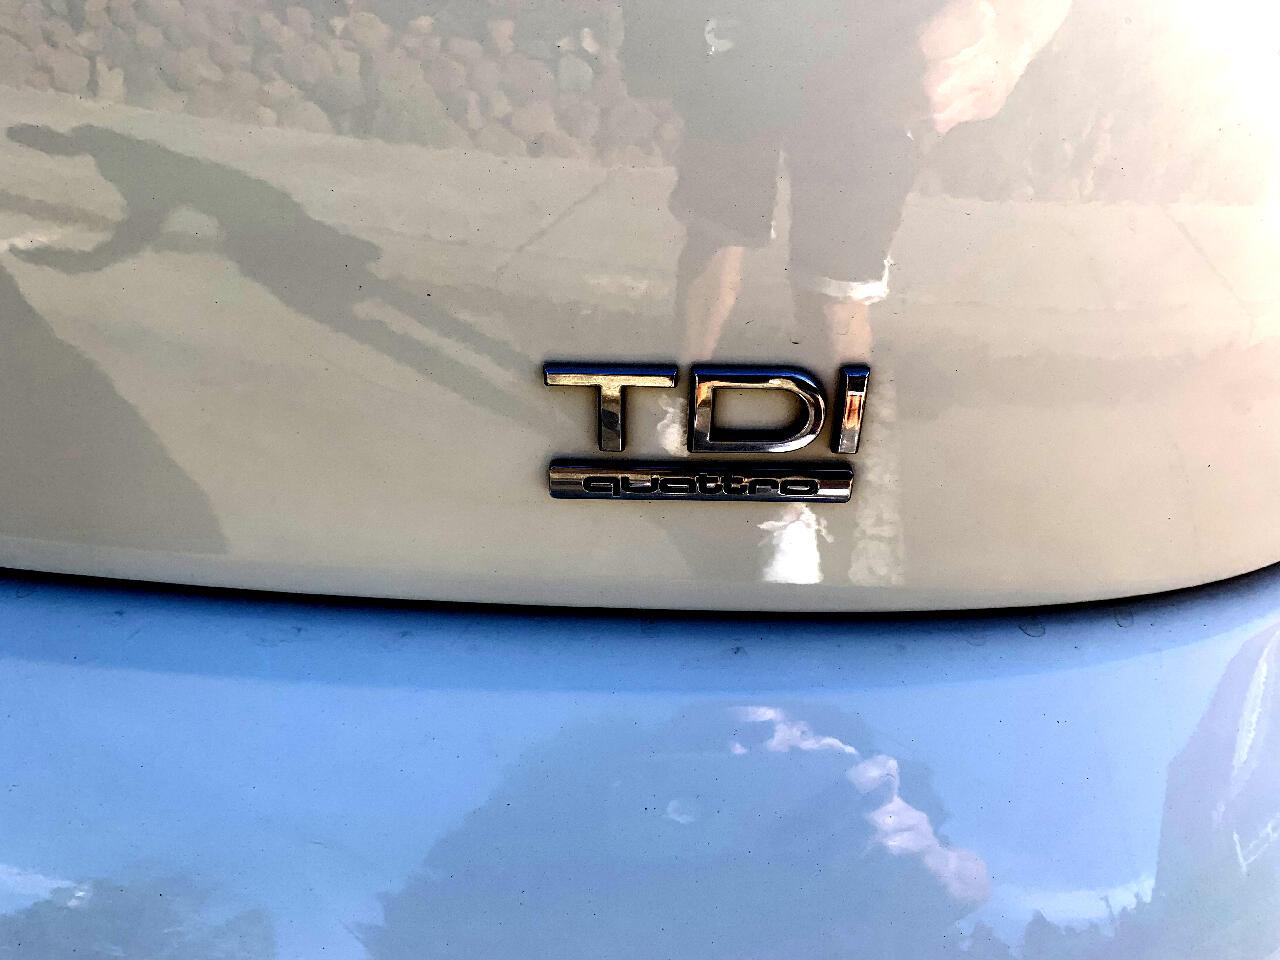 2009 Audi Q7 TDI QUATTRO PRESTIGE S LINE